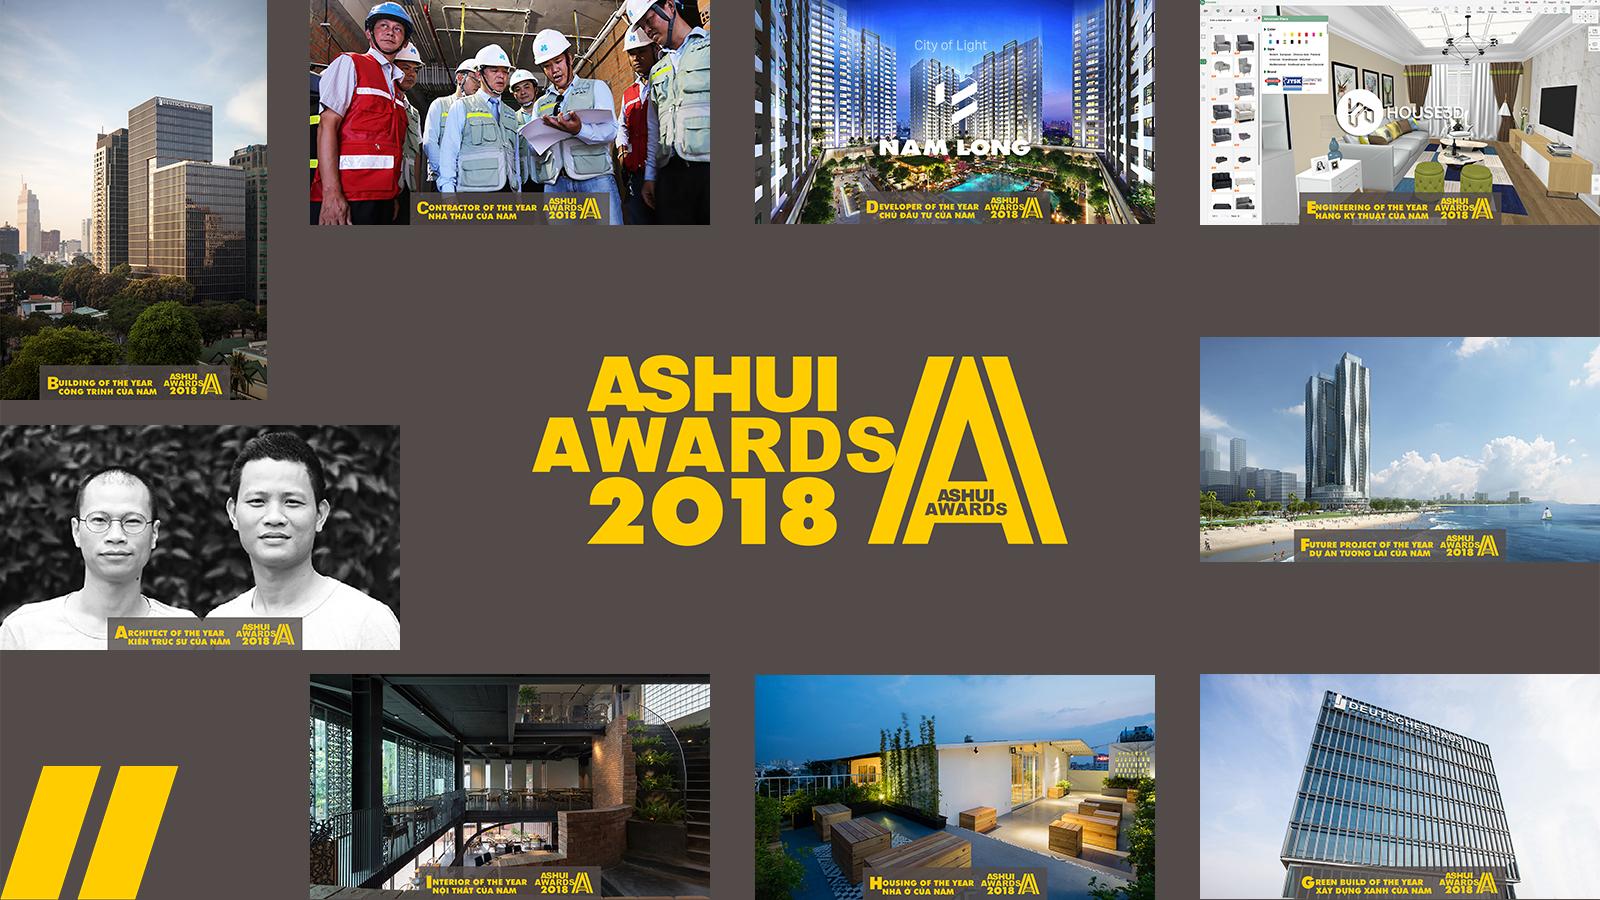 Ashui Awards 2018 10